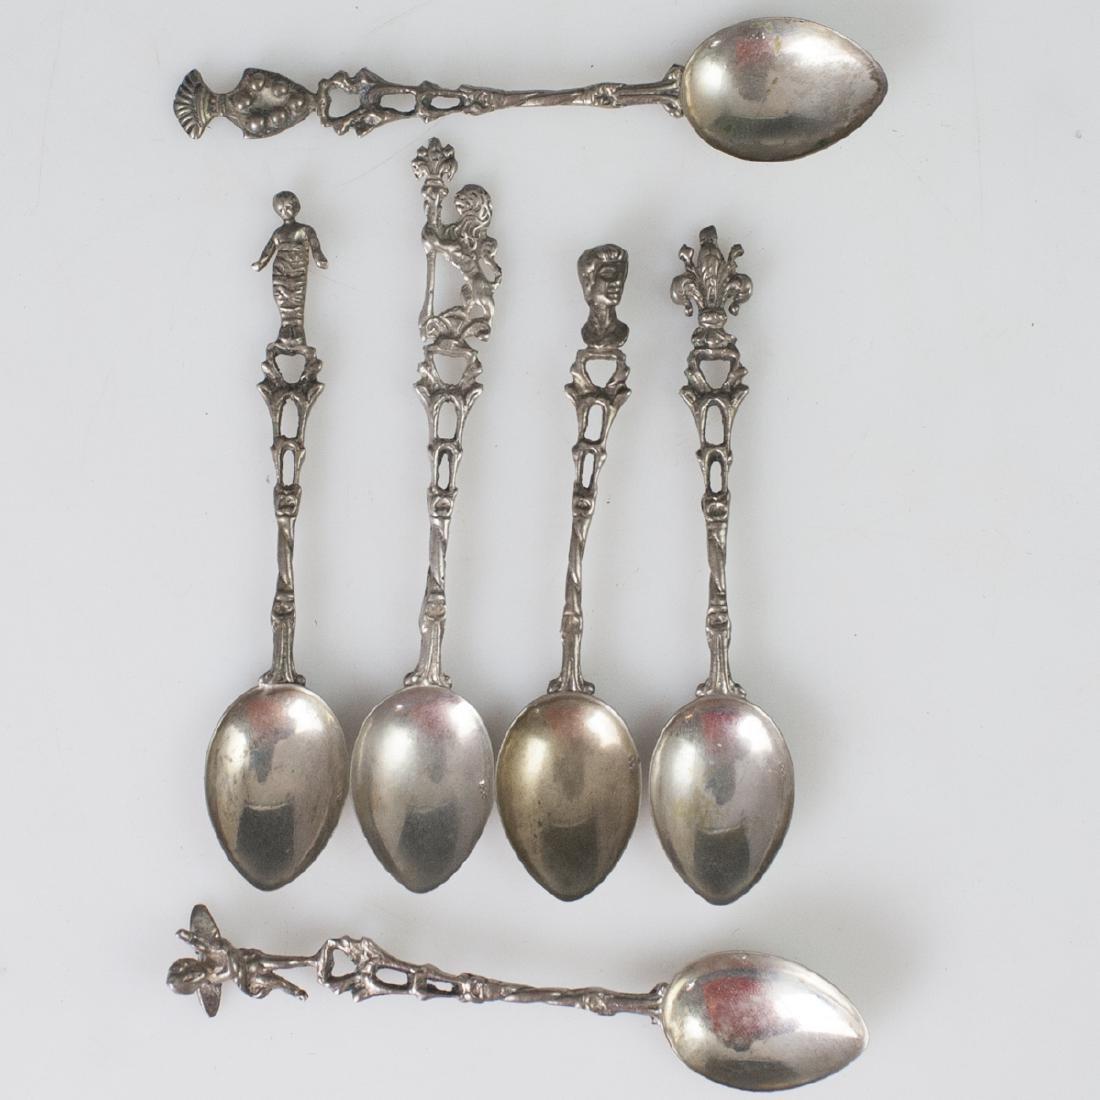 Antique Figural .800 Silver Demitasse Spoons